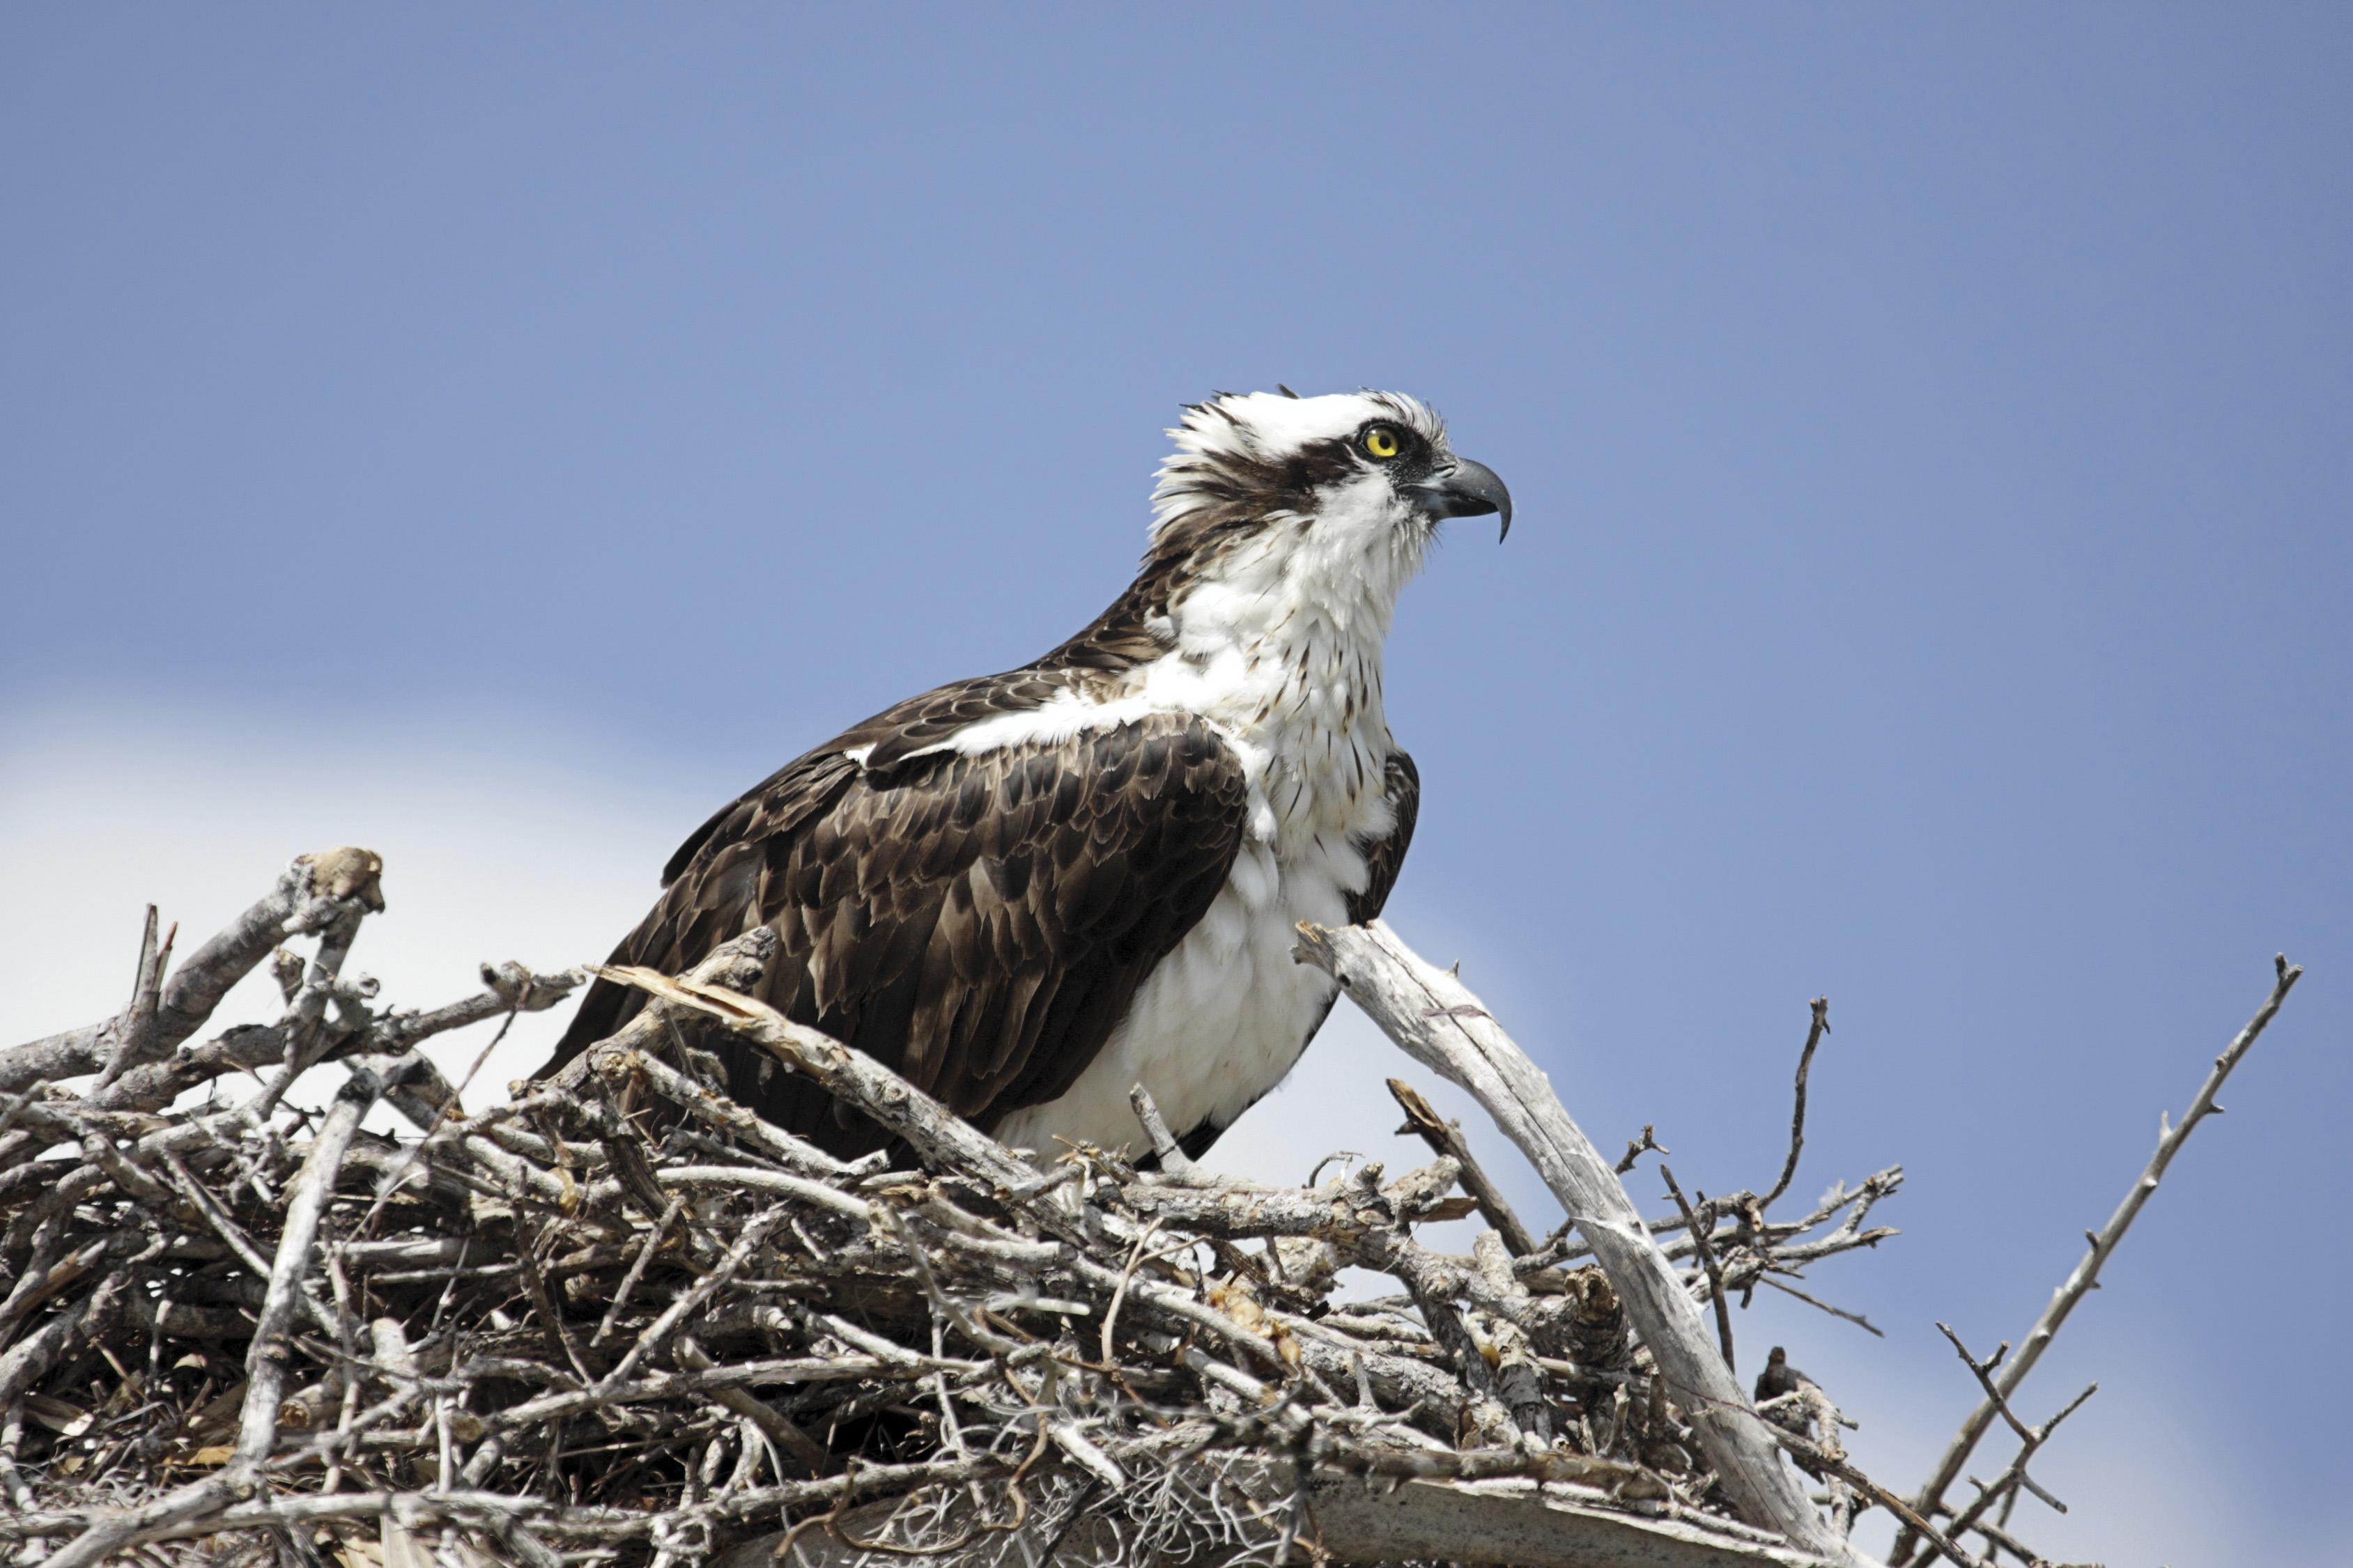 C-ROTO osprey photo